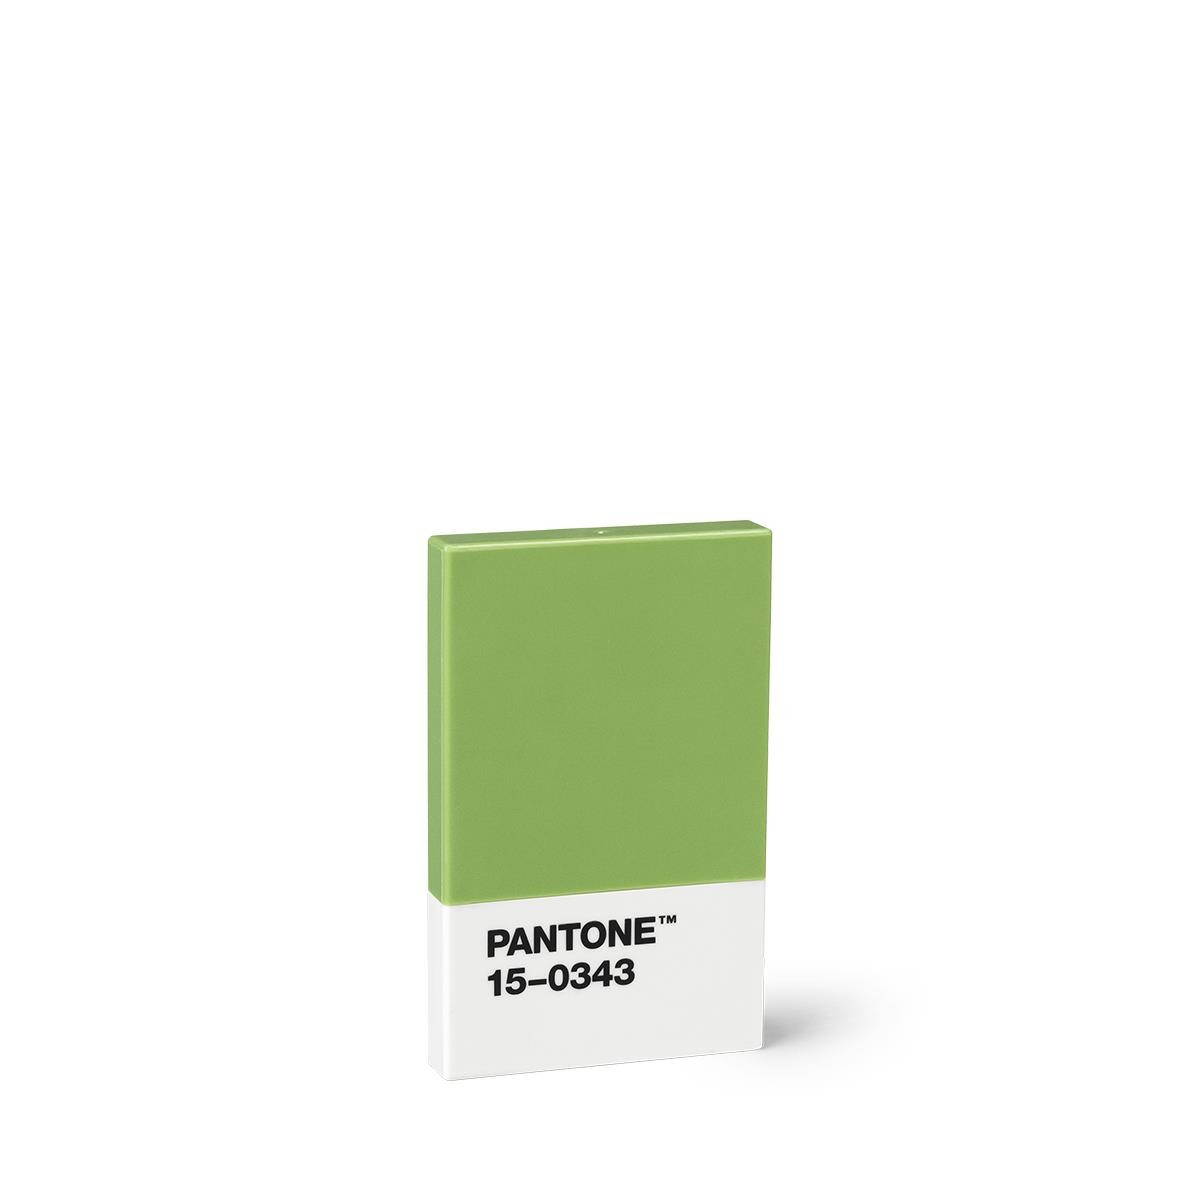 Kreditkarte Visitenkartenetui Grün 15 0343 Pantone Büro Produkte